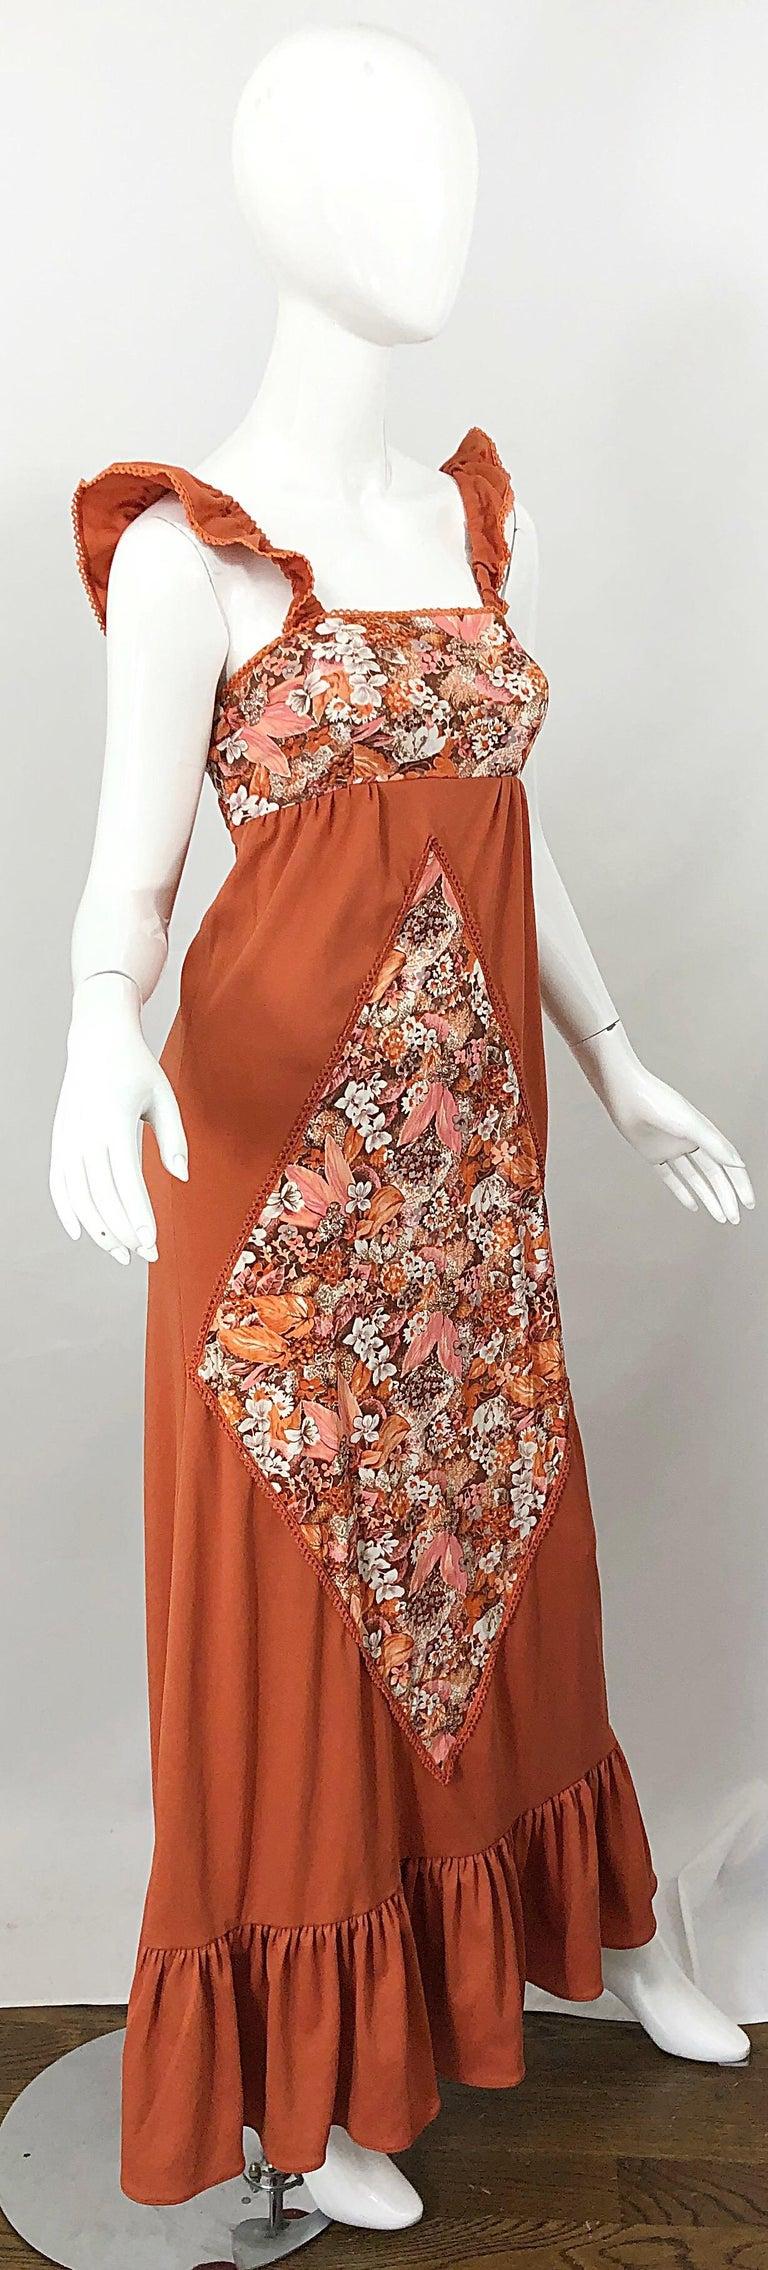 1970s Burnt Orange Patchwork Flowers Boho Vintage 70s Jersey Autumnal Maxi Dress For Sale 2